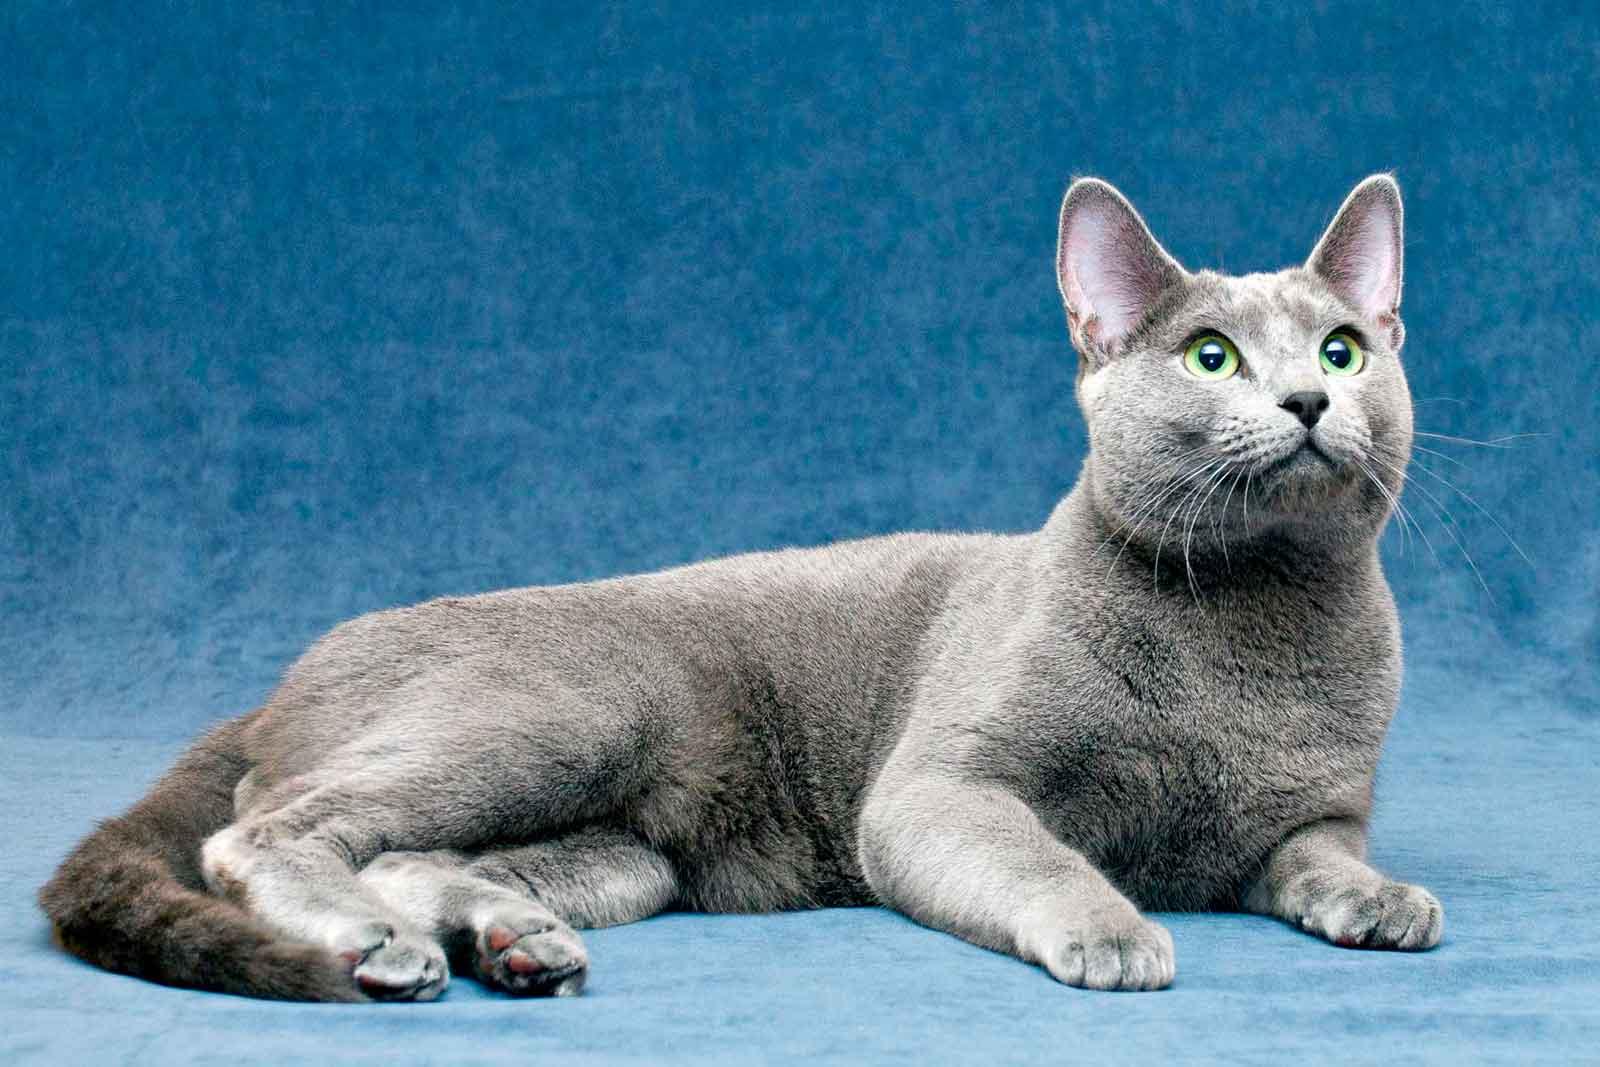 Кошка каракет – потомок степной рыси